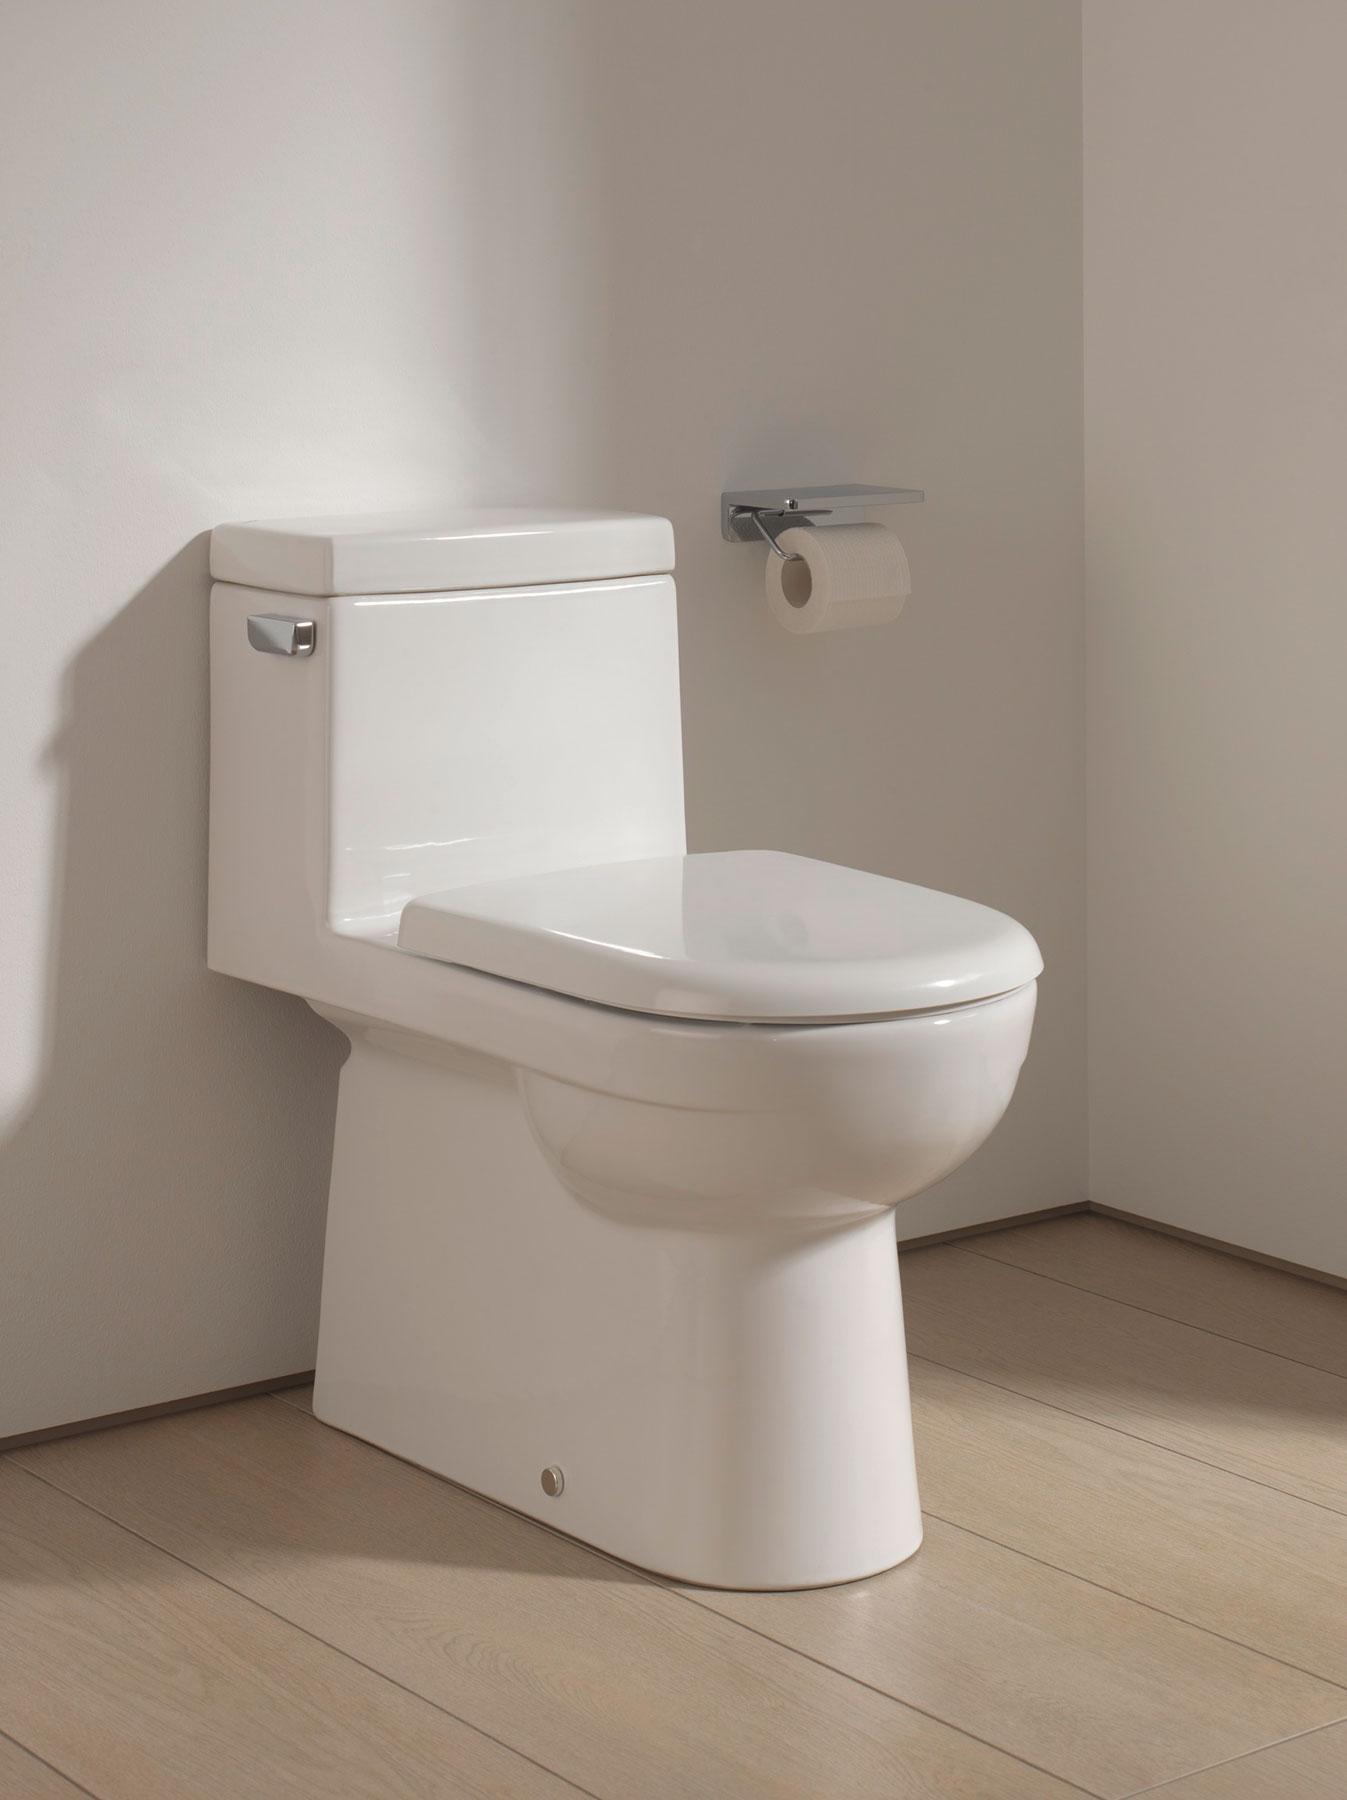 Modern Pro Floorstanding Toilet first image